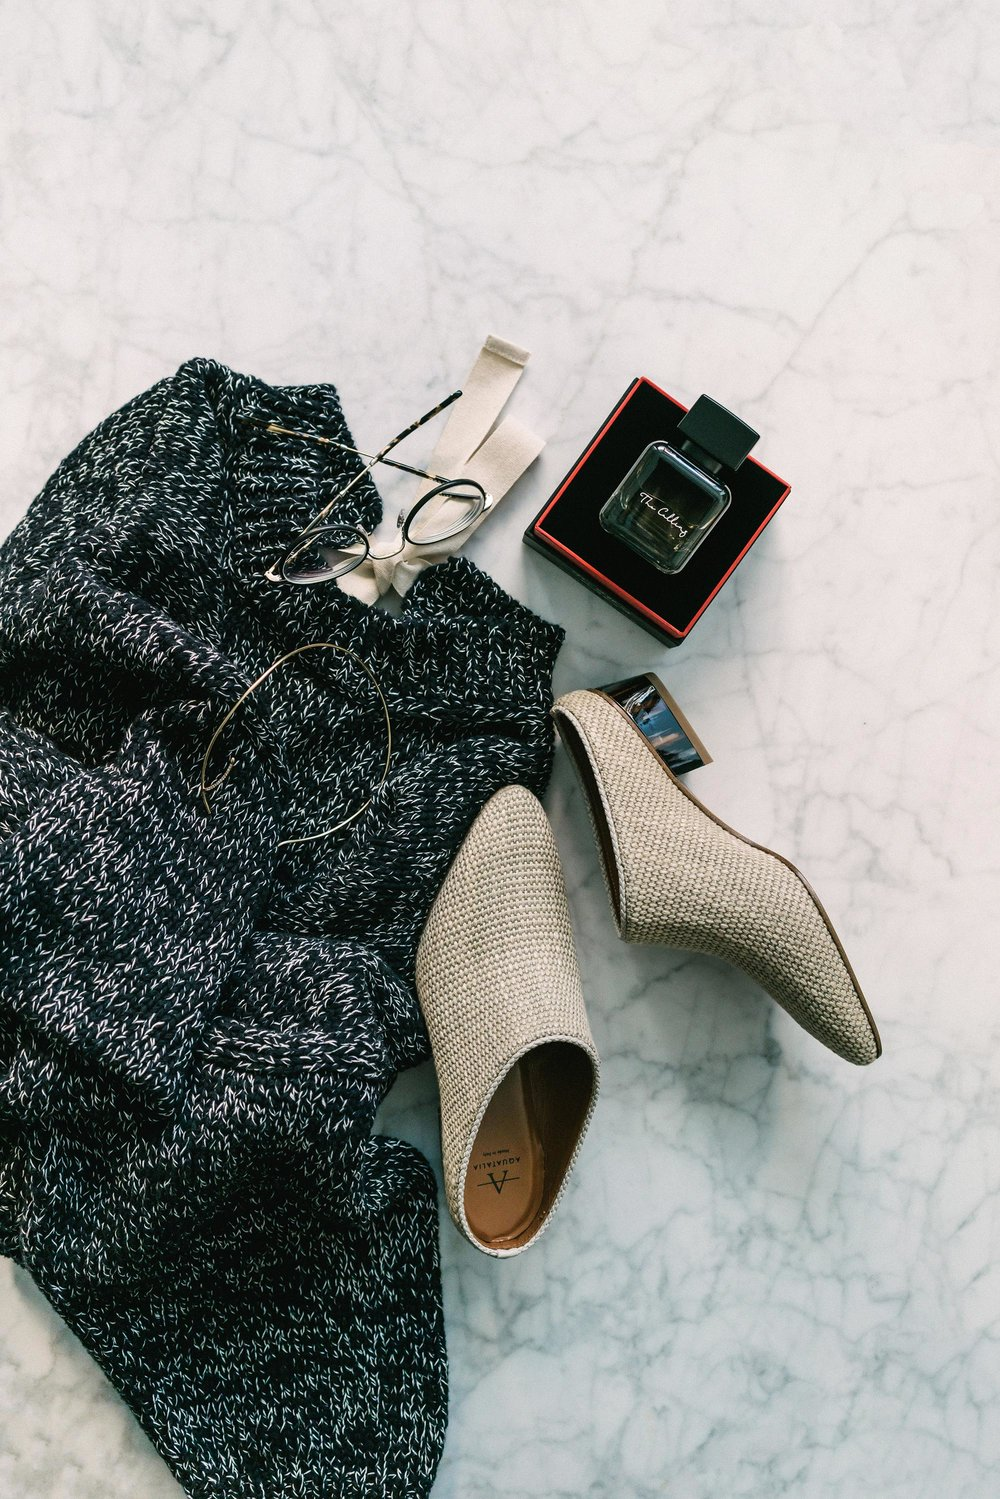 J.W. Anderson Sweater, Aquatalia Shoes, Garrett Leight x Want Les Essentiels Glasses, Phuong Dang Fragrance, Kat Kim Fine Jewelry Choker